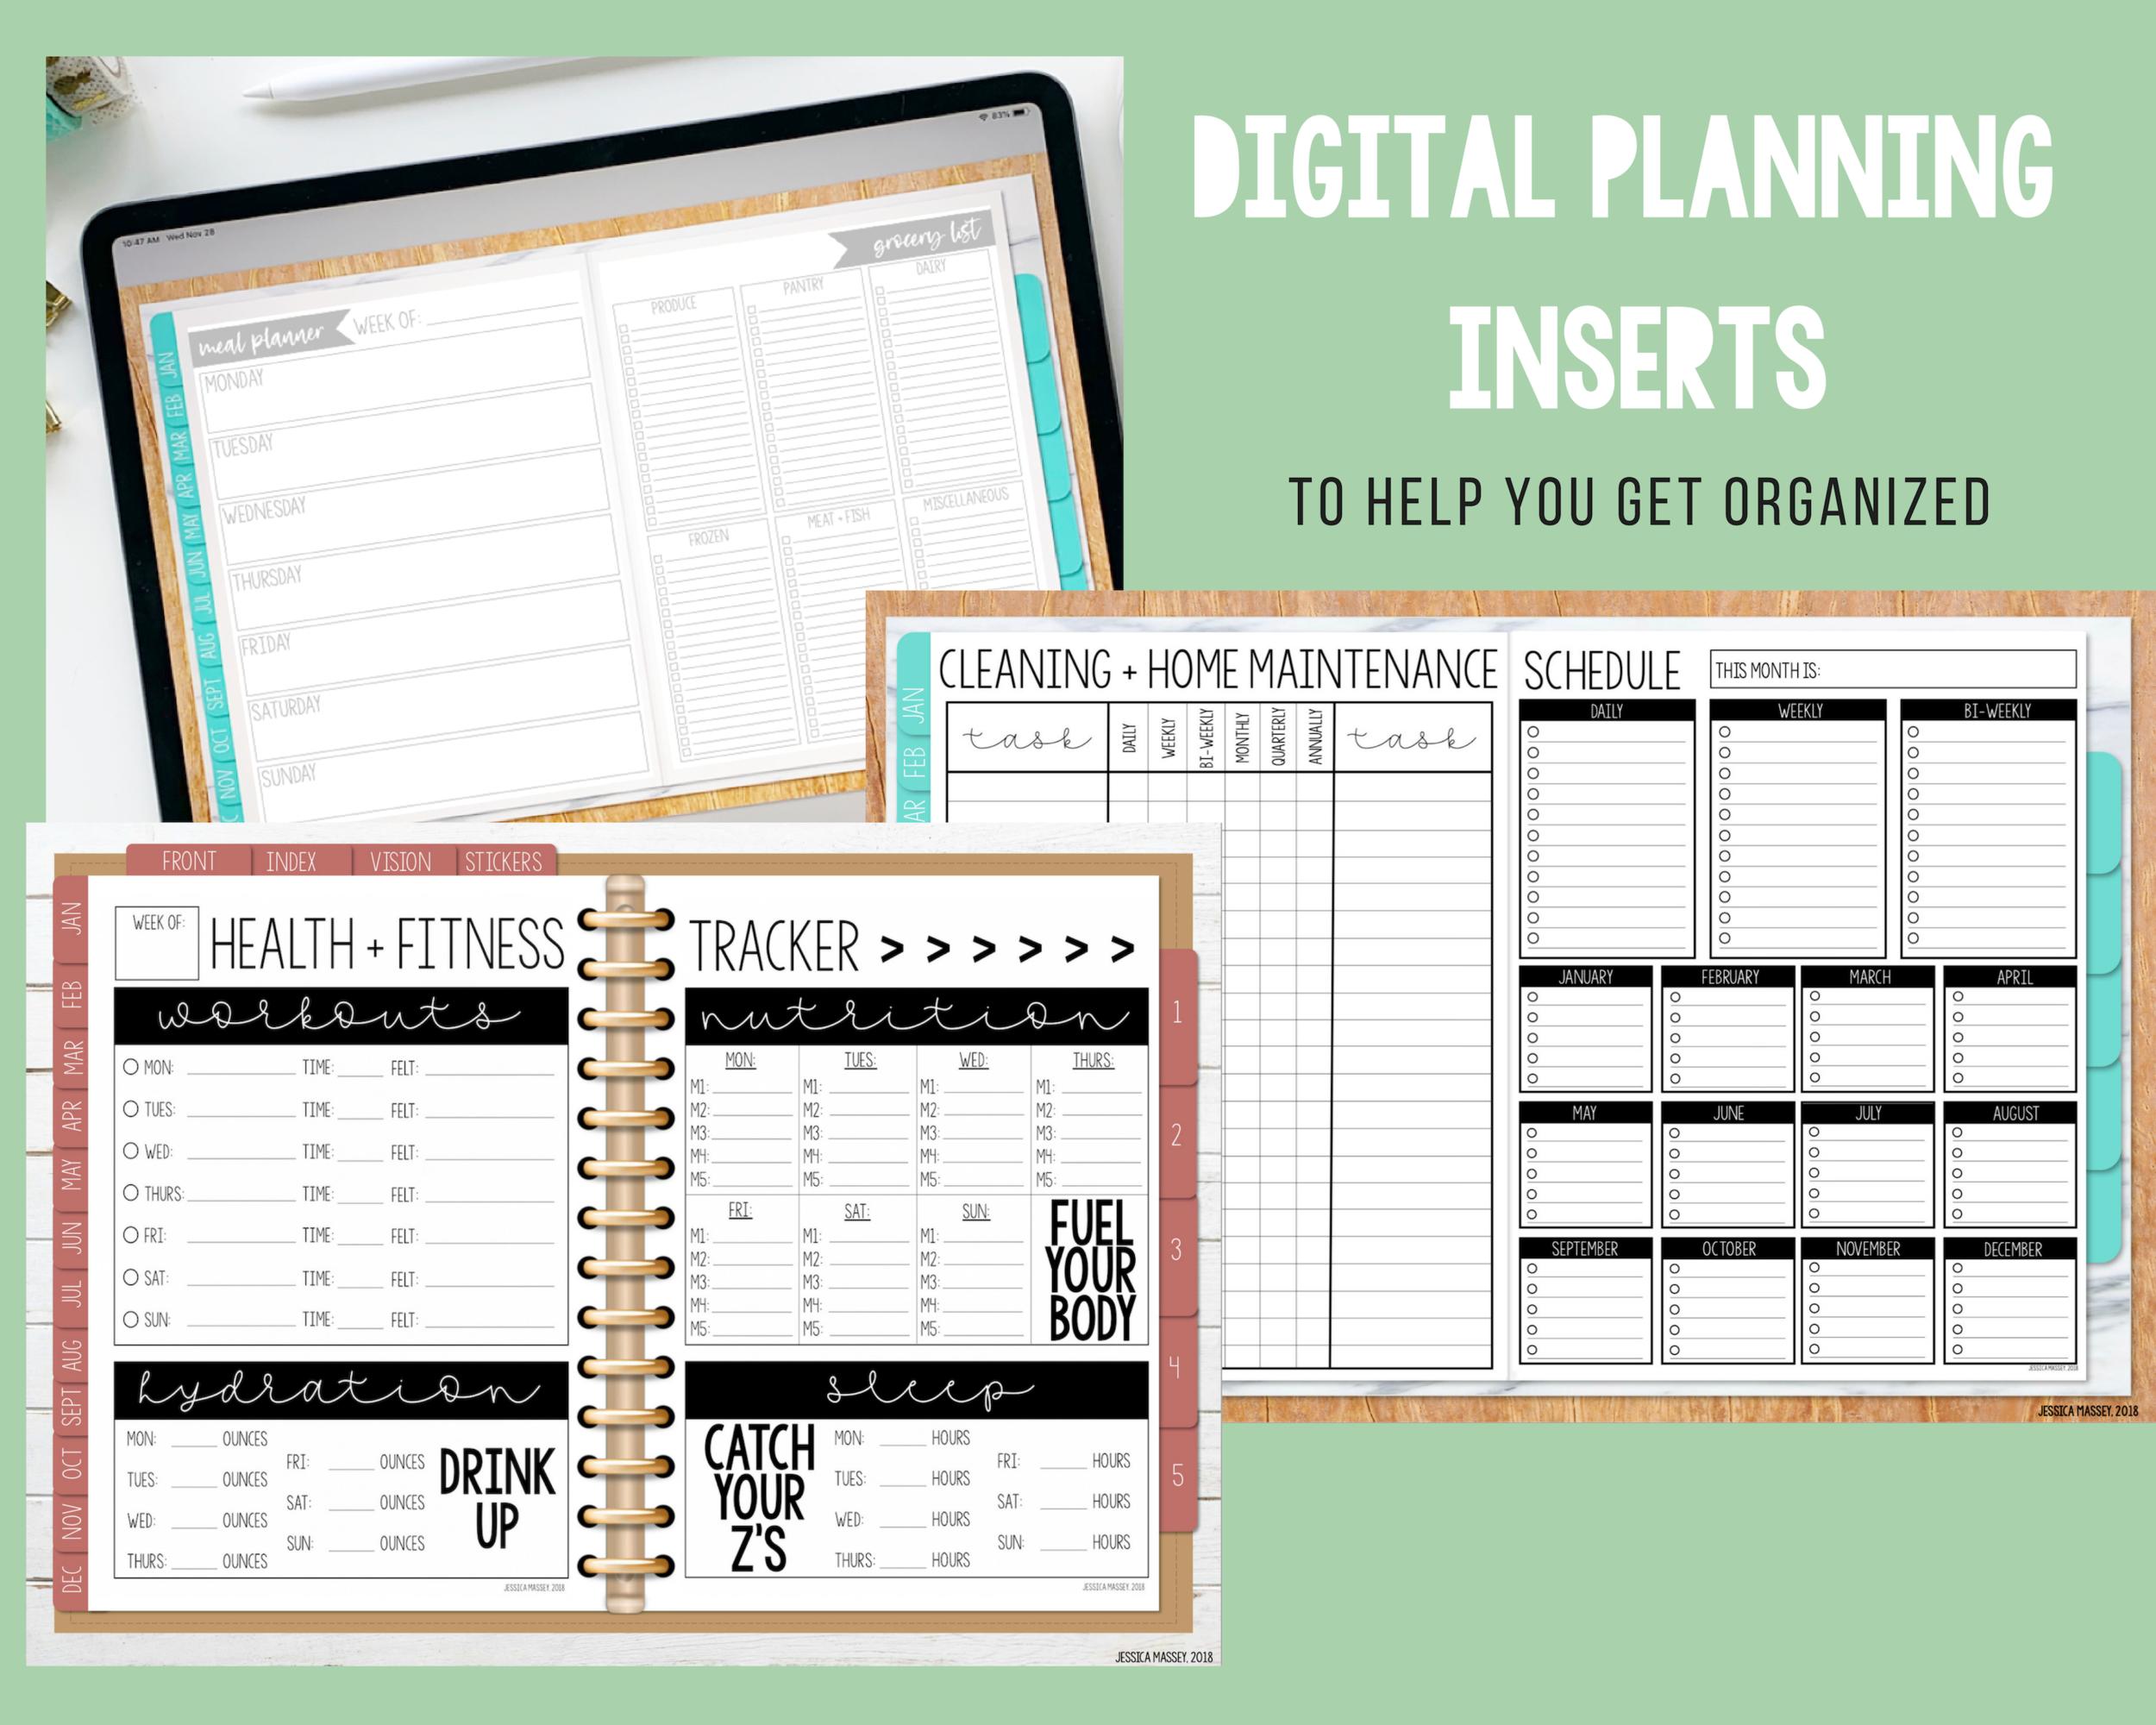 Digital Planning Inserts.png